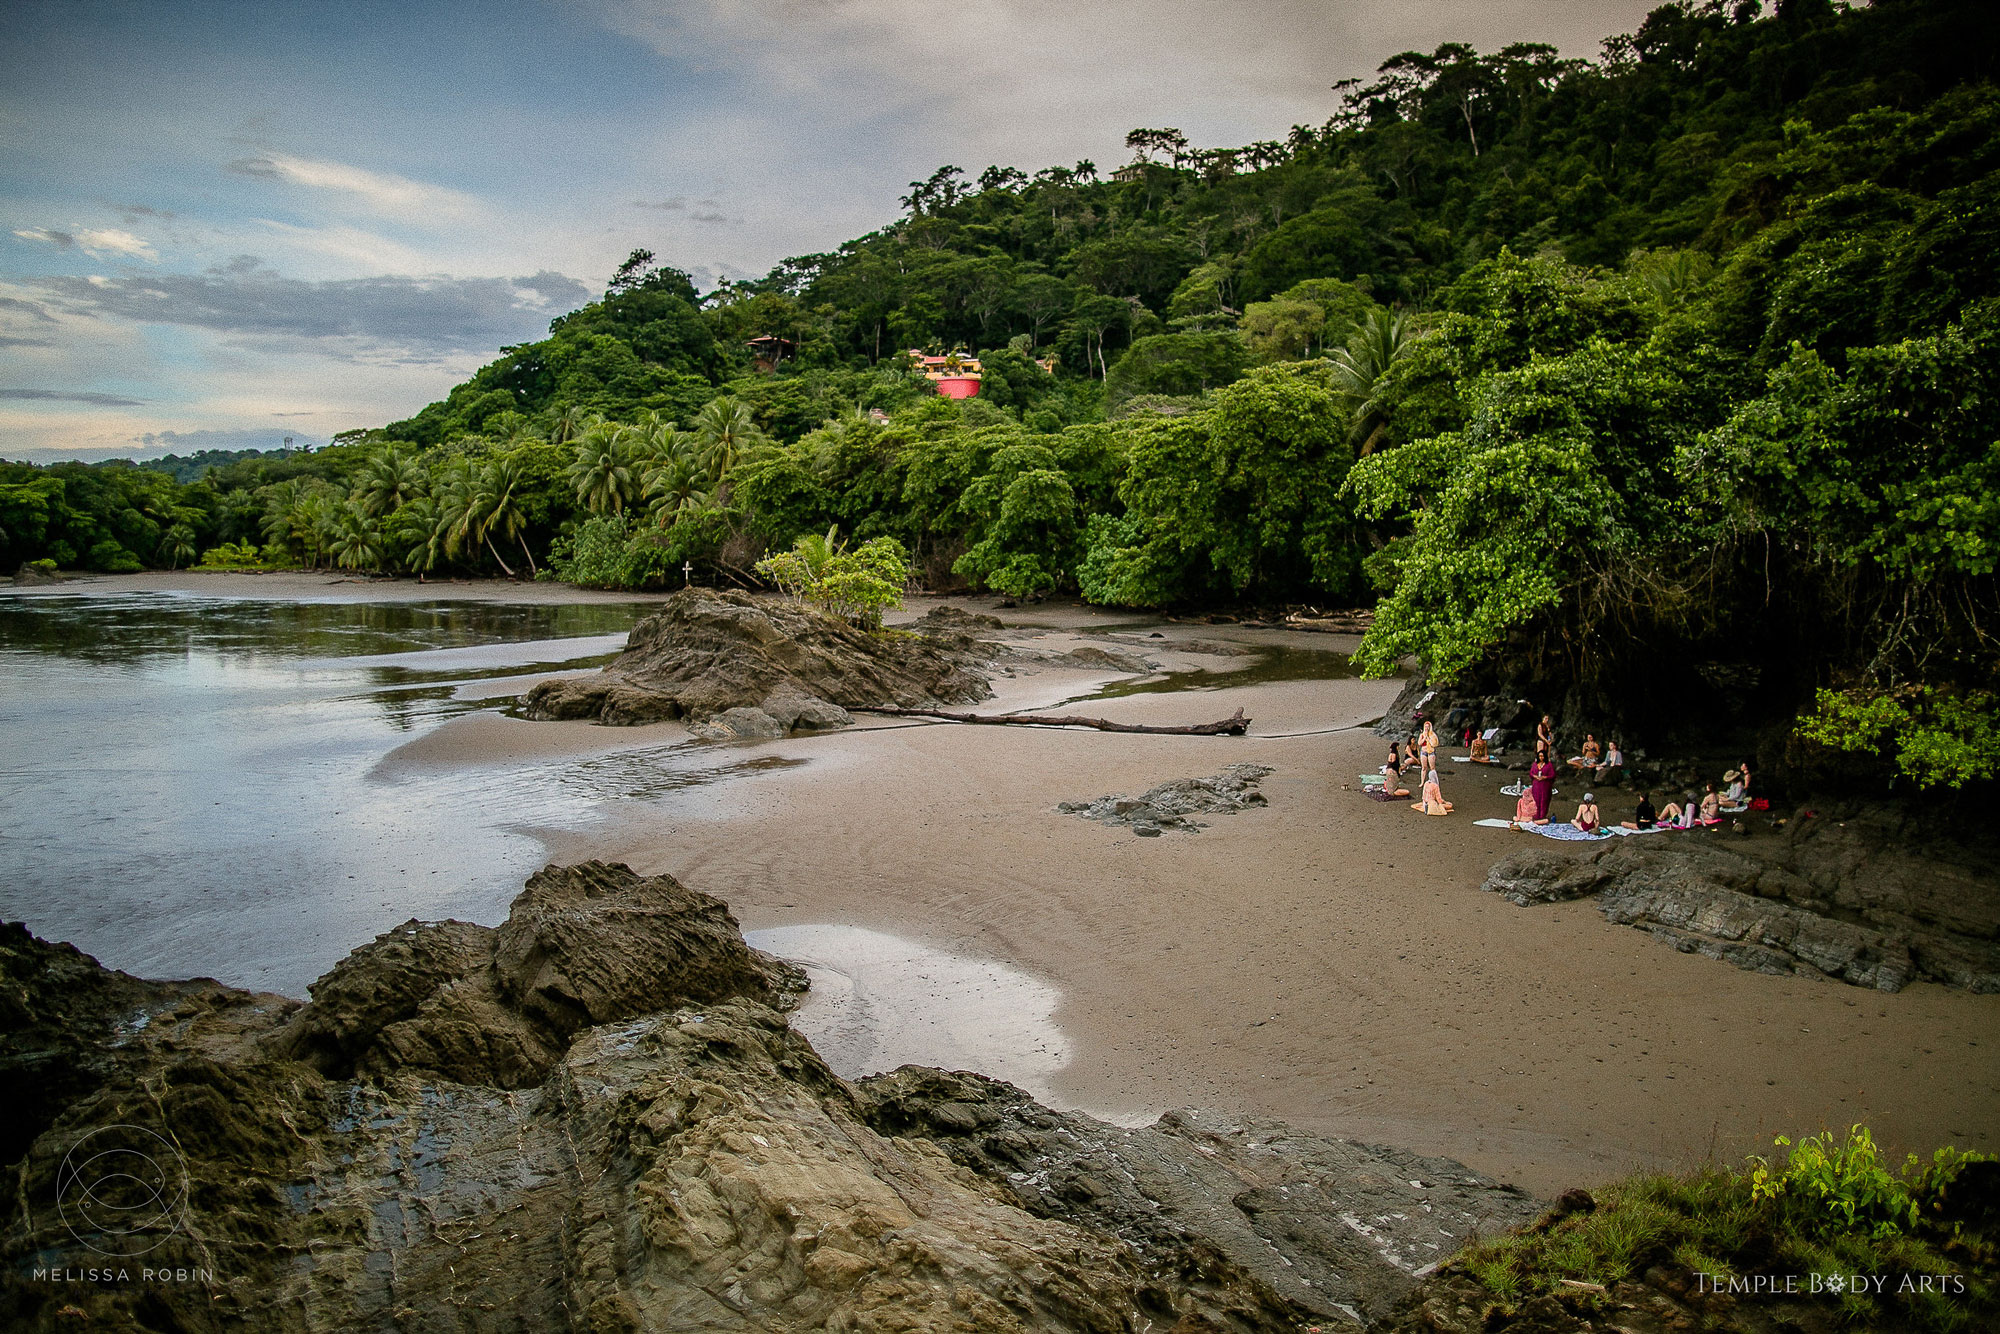 Danyasa Yoga Retreat - Danyasa Eco-Center - Dominical, Costa RicaJanuary 31 - February 6, 2020